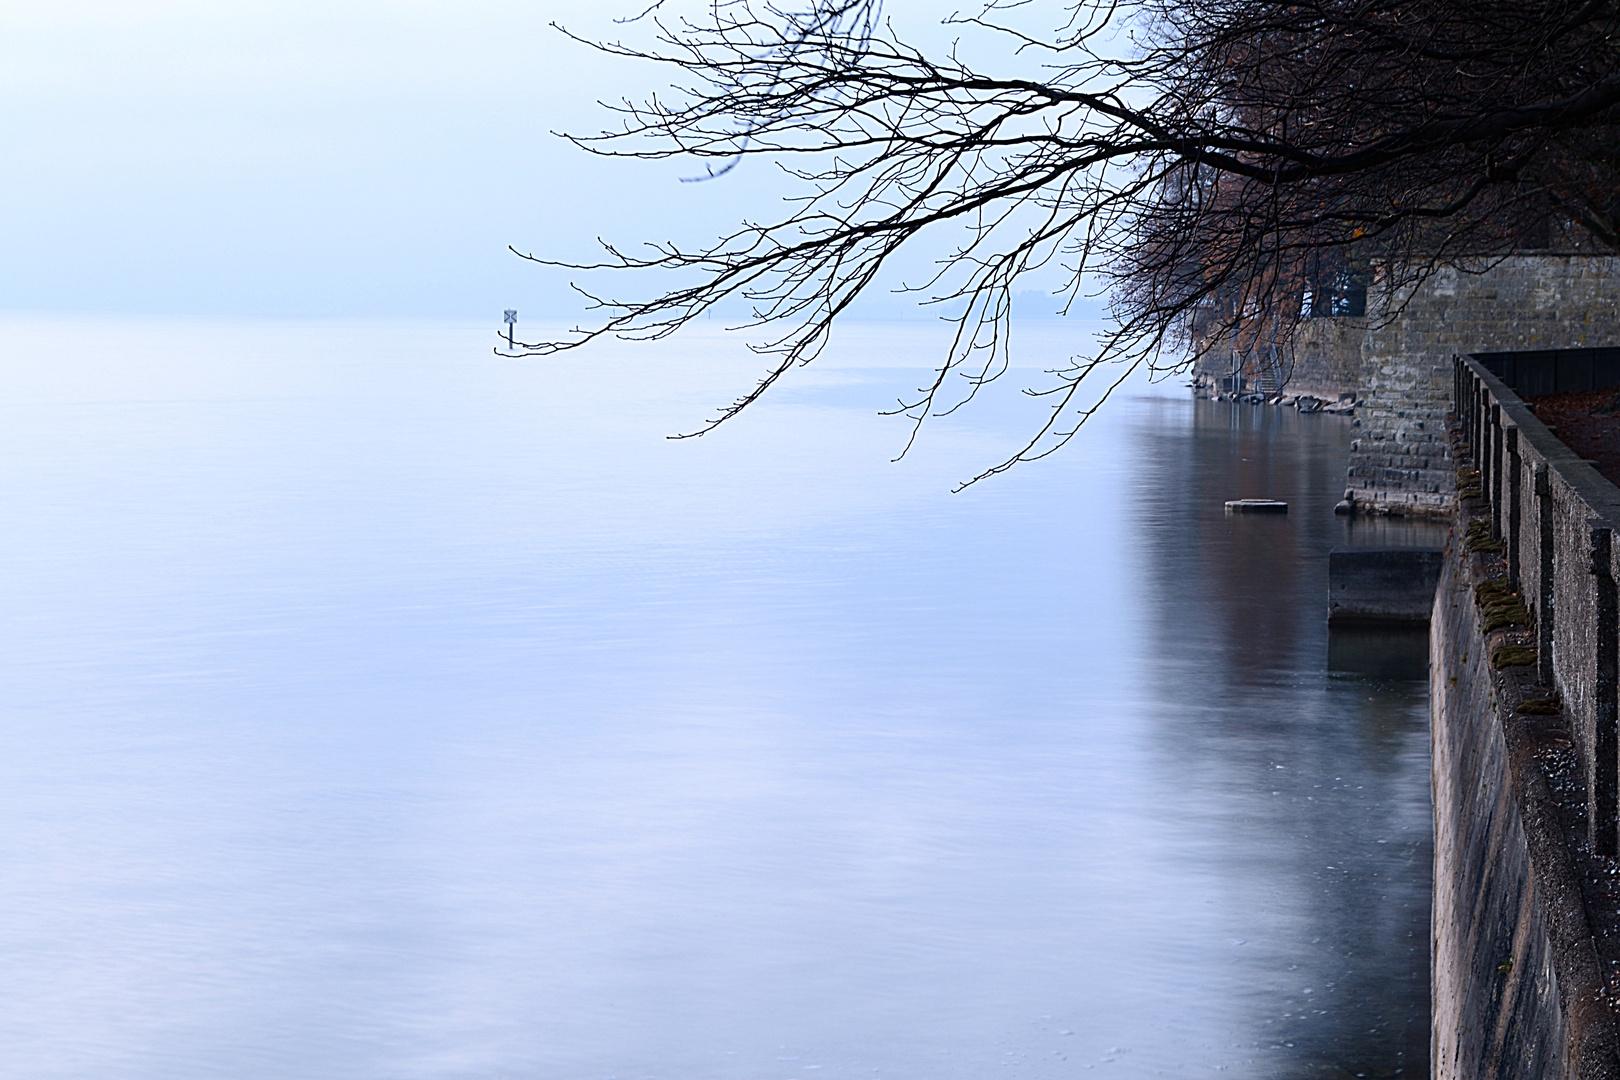 Novemberabend am Bodensee